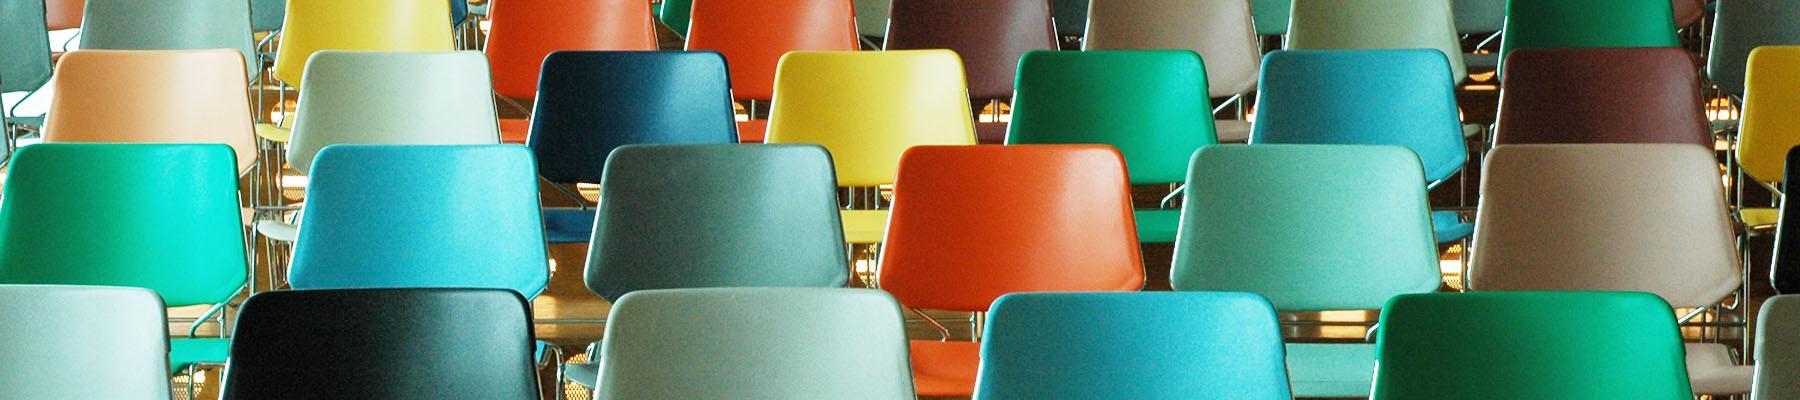 Corona-Modus und digitale Bildung